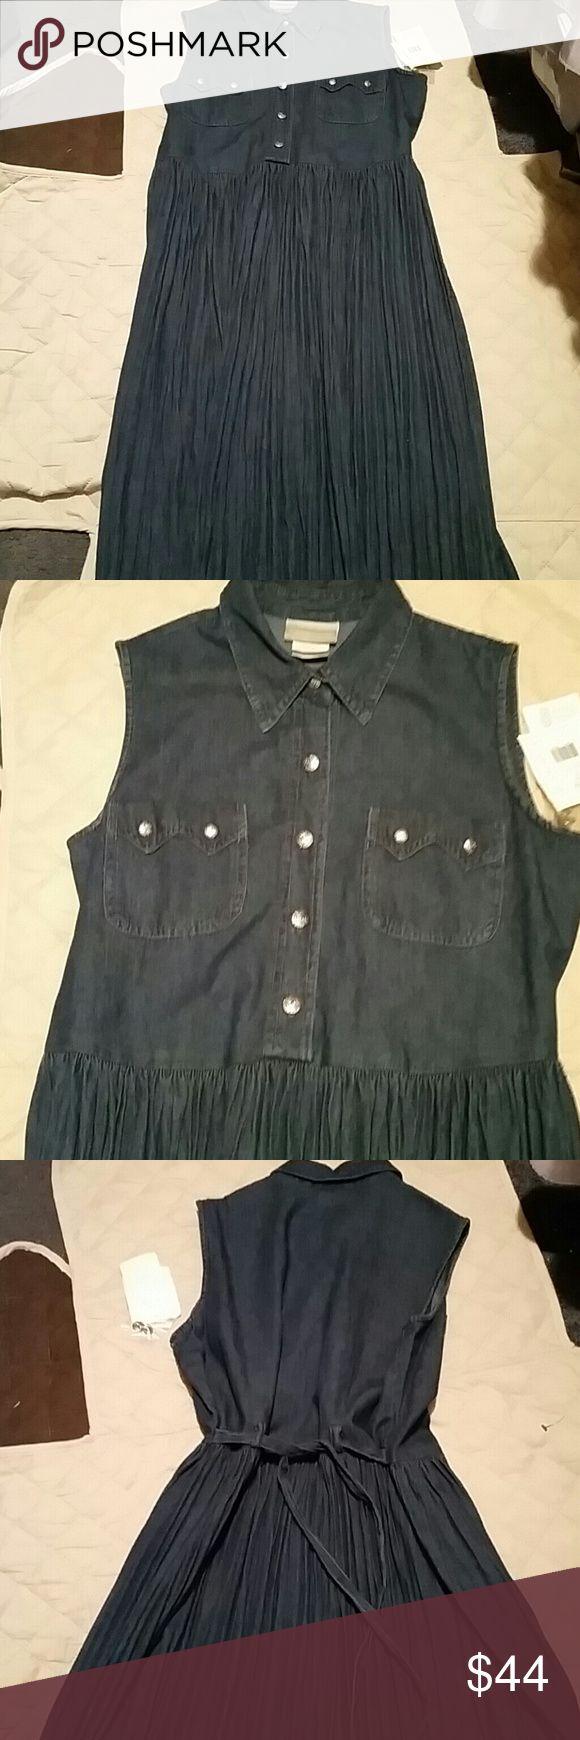 FINAL SALE!!! NWT Coldwater Creek dress size 8 New with tags Coldwater Creek dress size 8 100% cotton Coldwater Creek Dresses Maxi